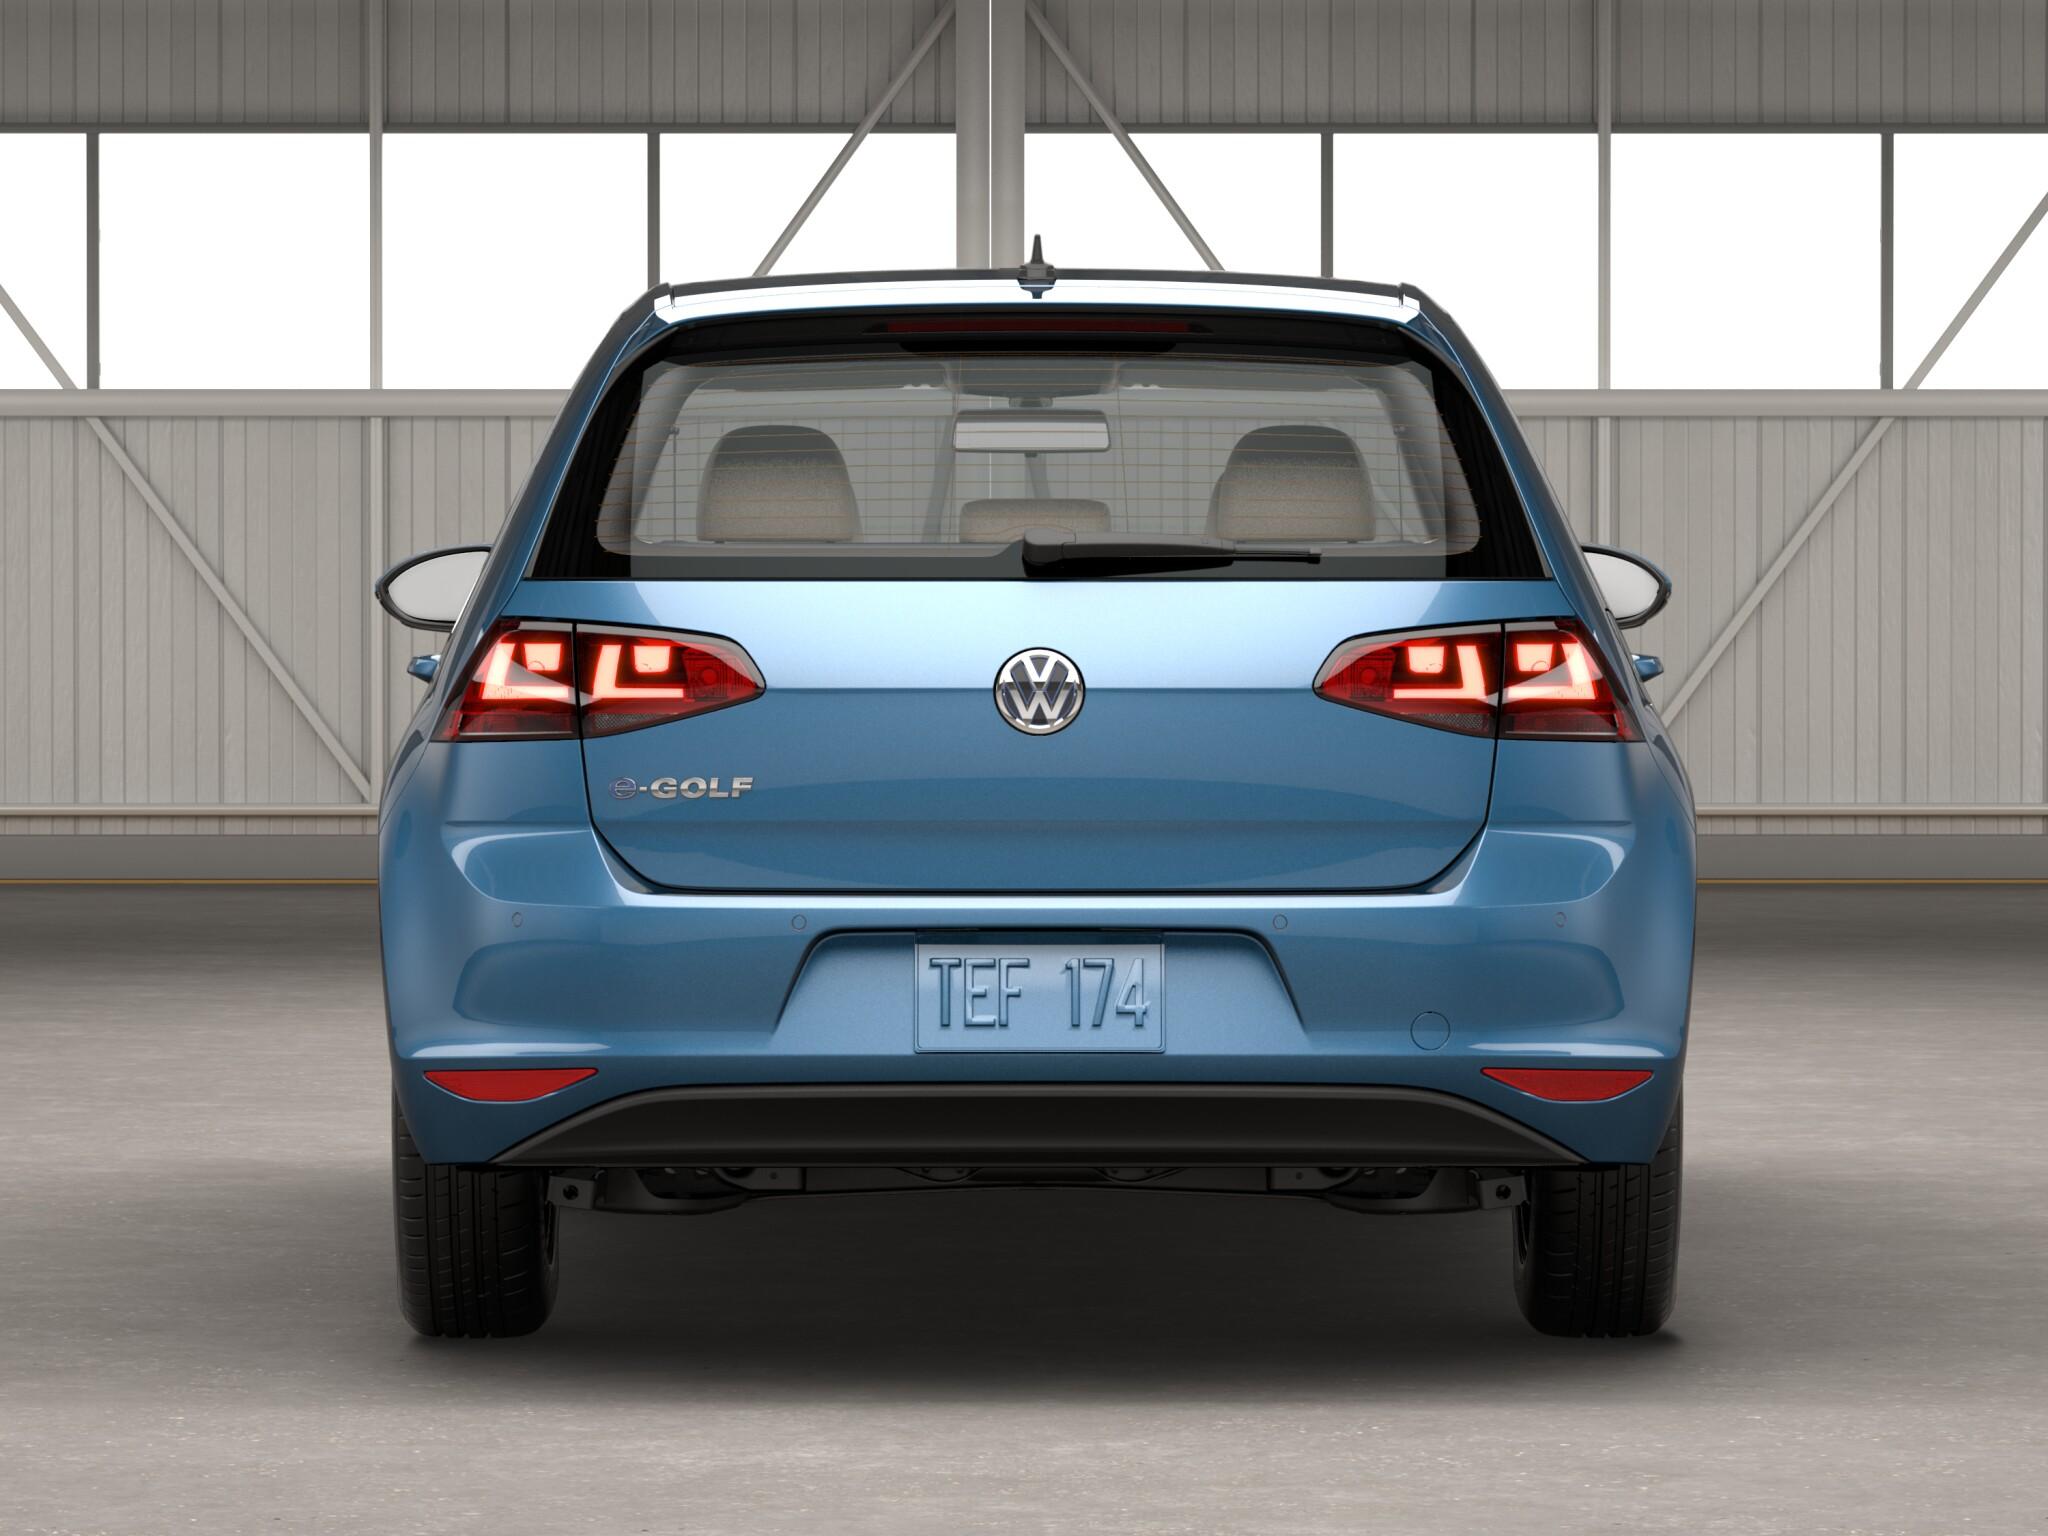 2016 Volkswagen e-Golf Rear End View